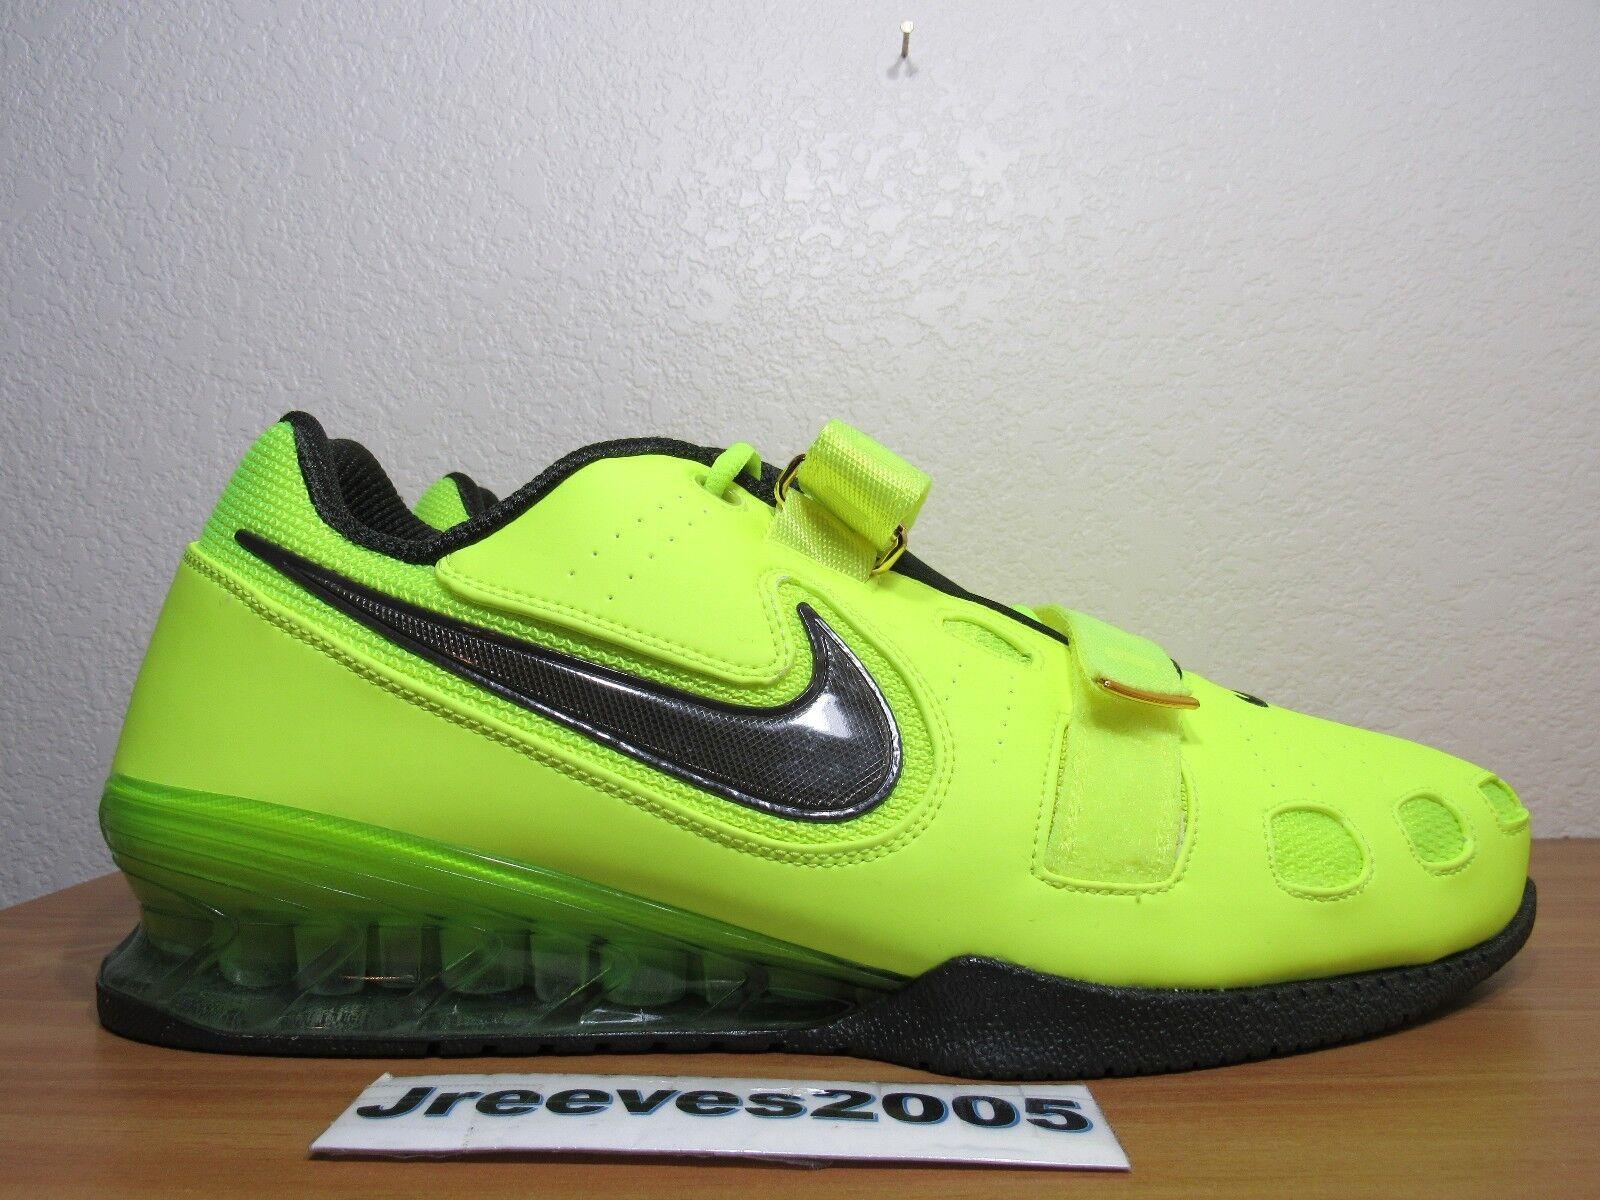 Nike romaleos 2 krafttraining sz 15 100% 476927 authentische powerlifting volt 476927 100% 700 fcd28e